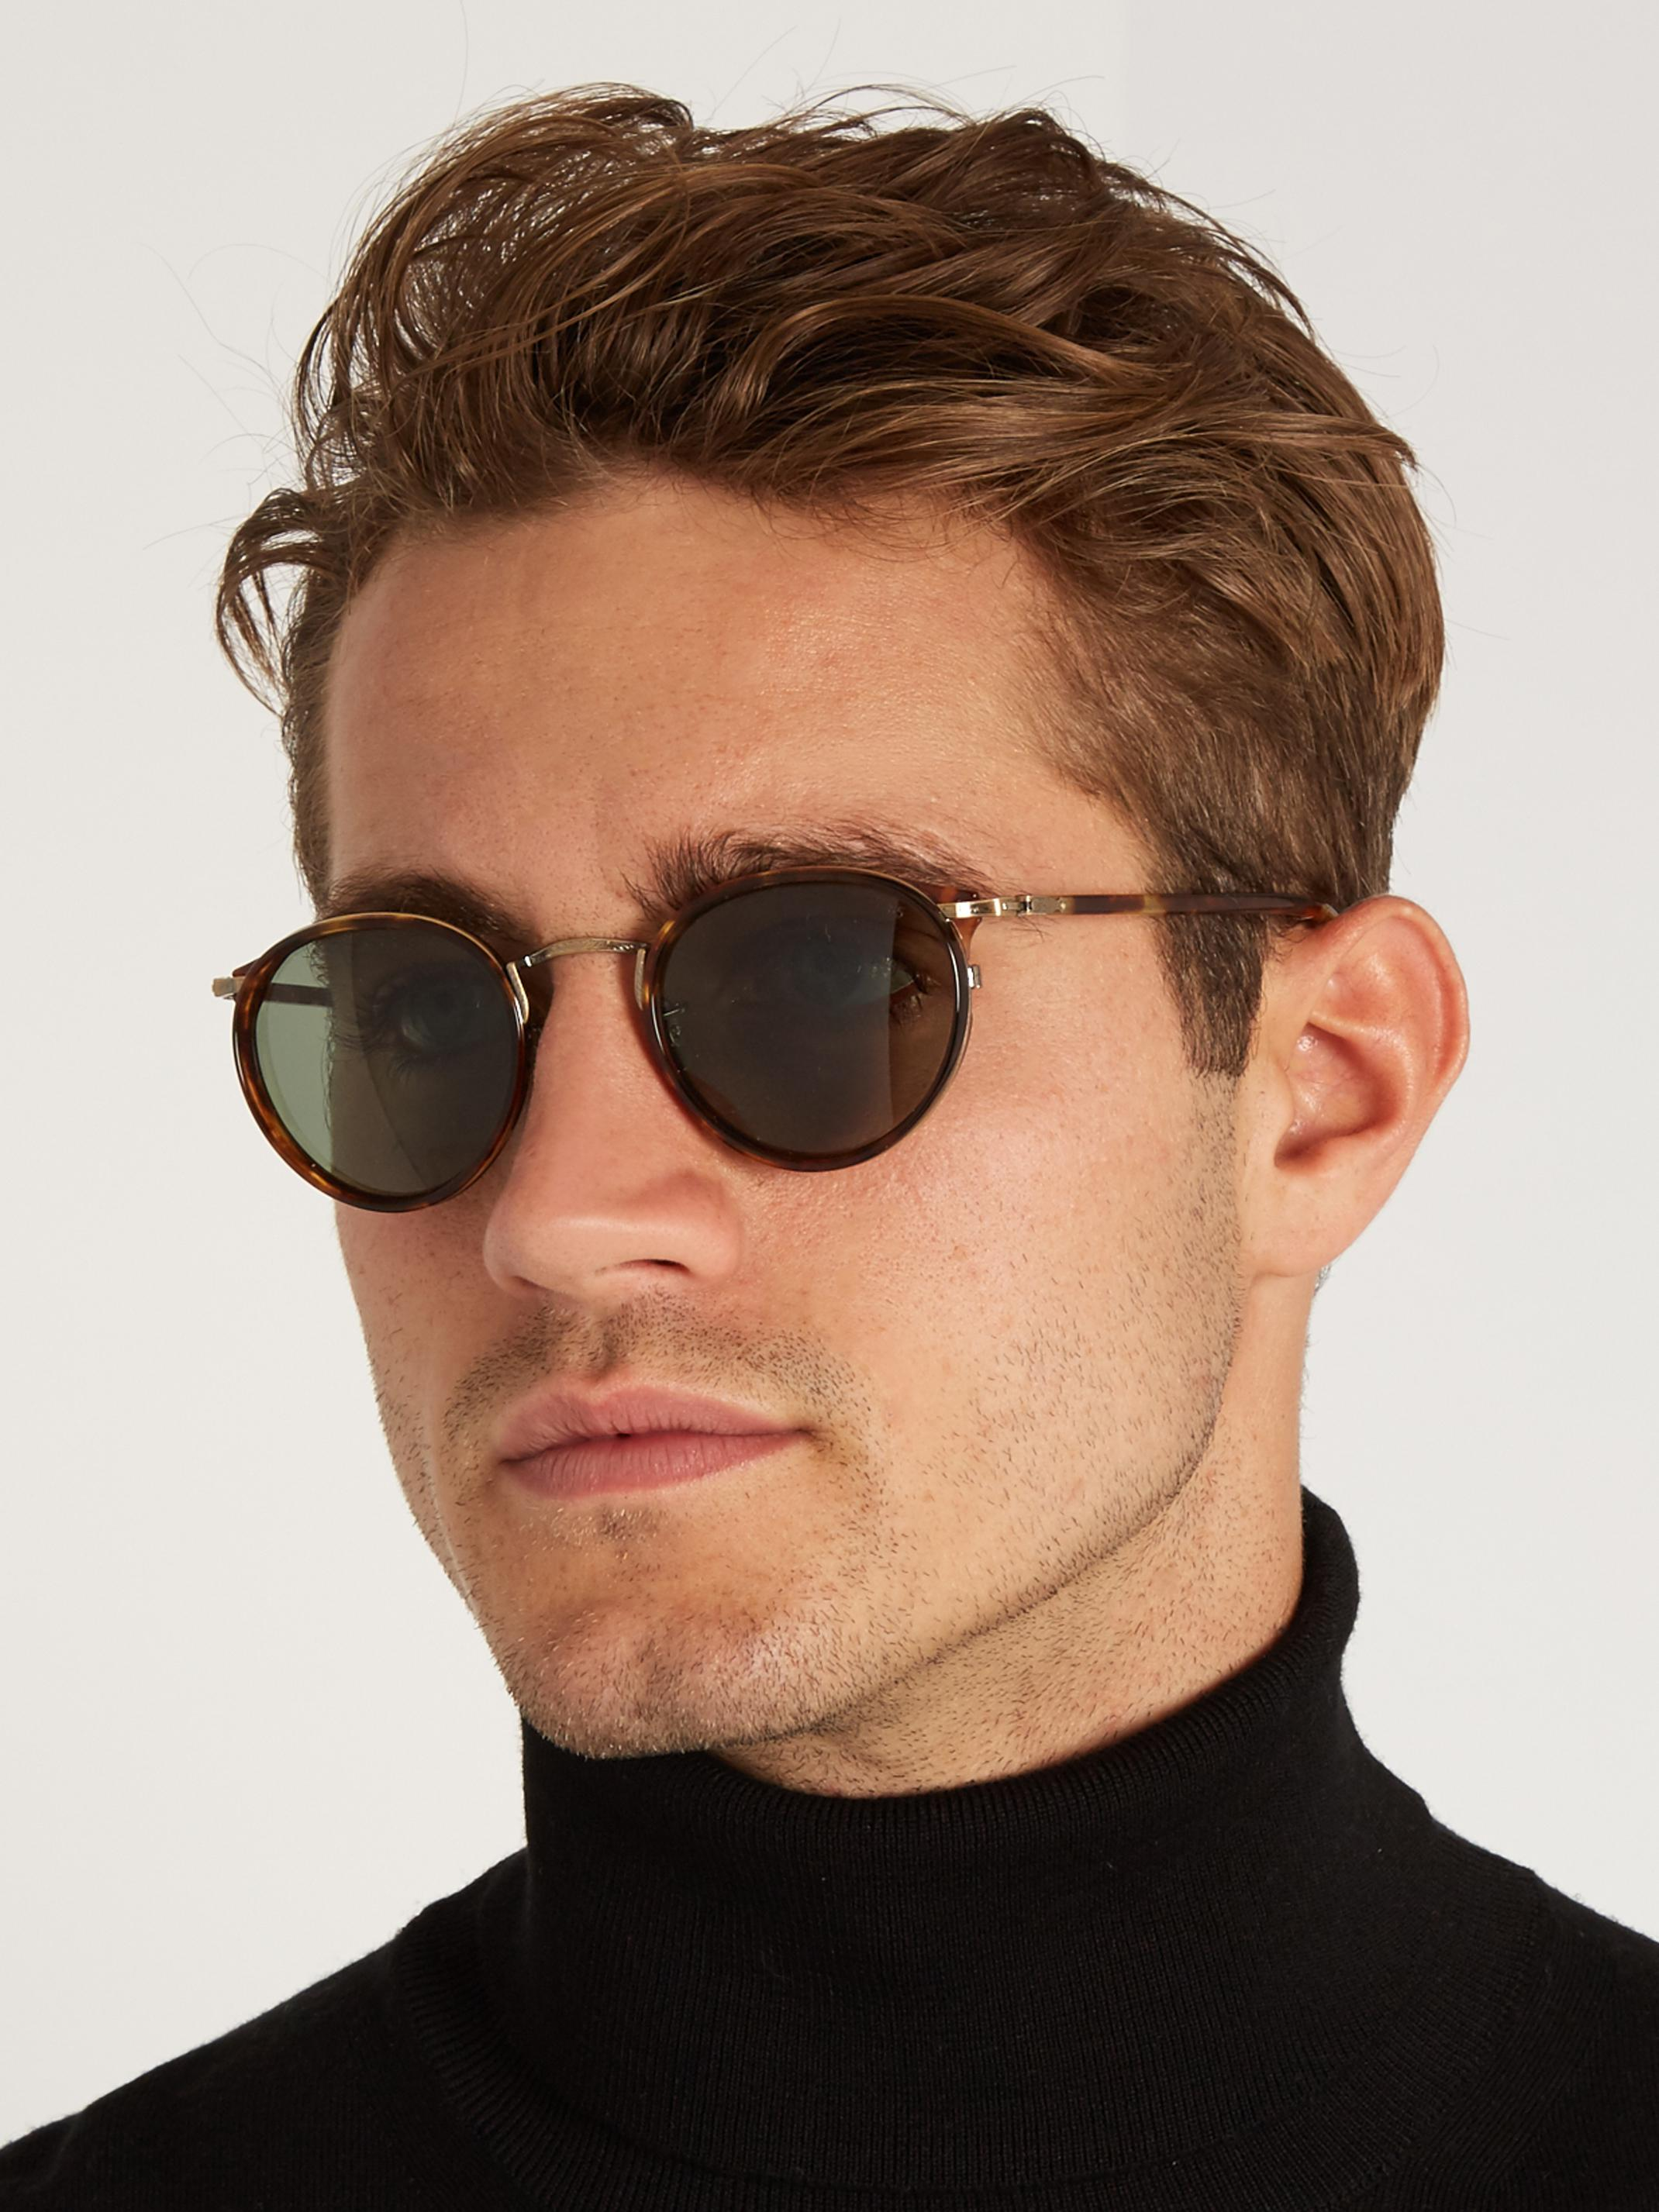 ac9062a53c Lyst - Cutler   Gross 1007 D-Frame Acetate Sunglasses in Brown for Men